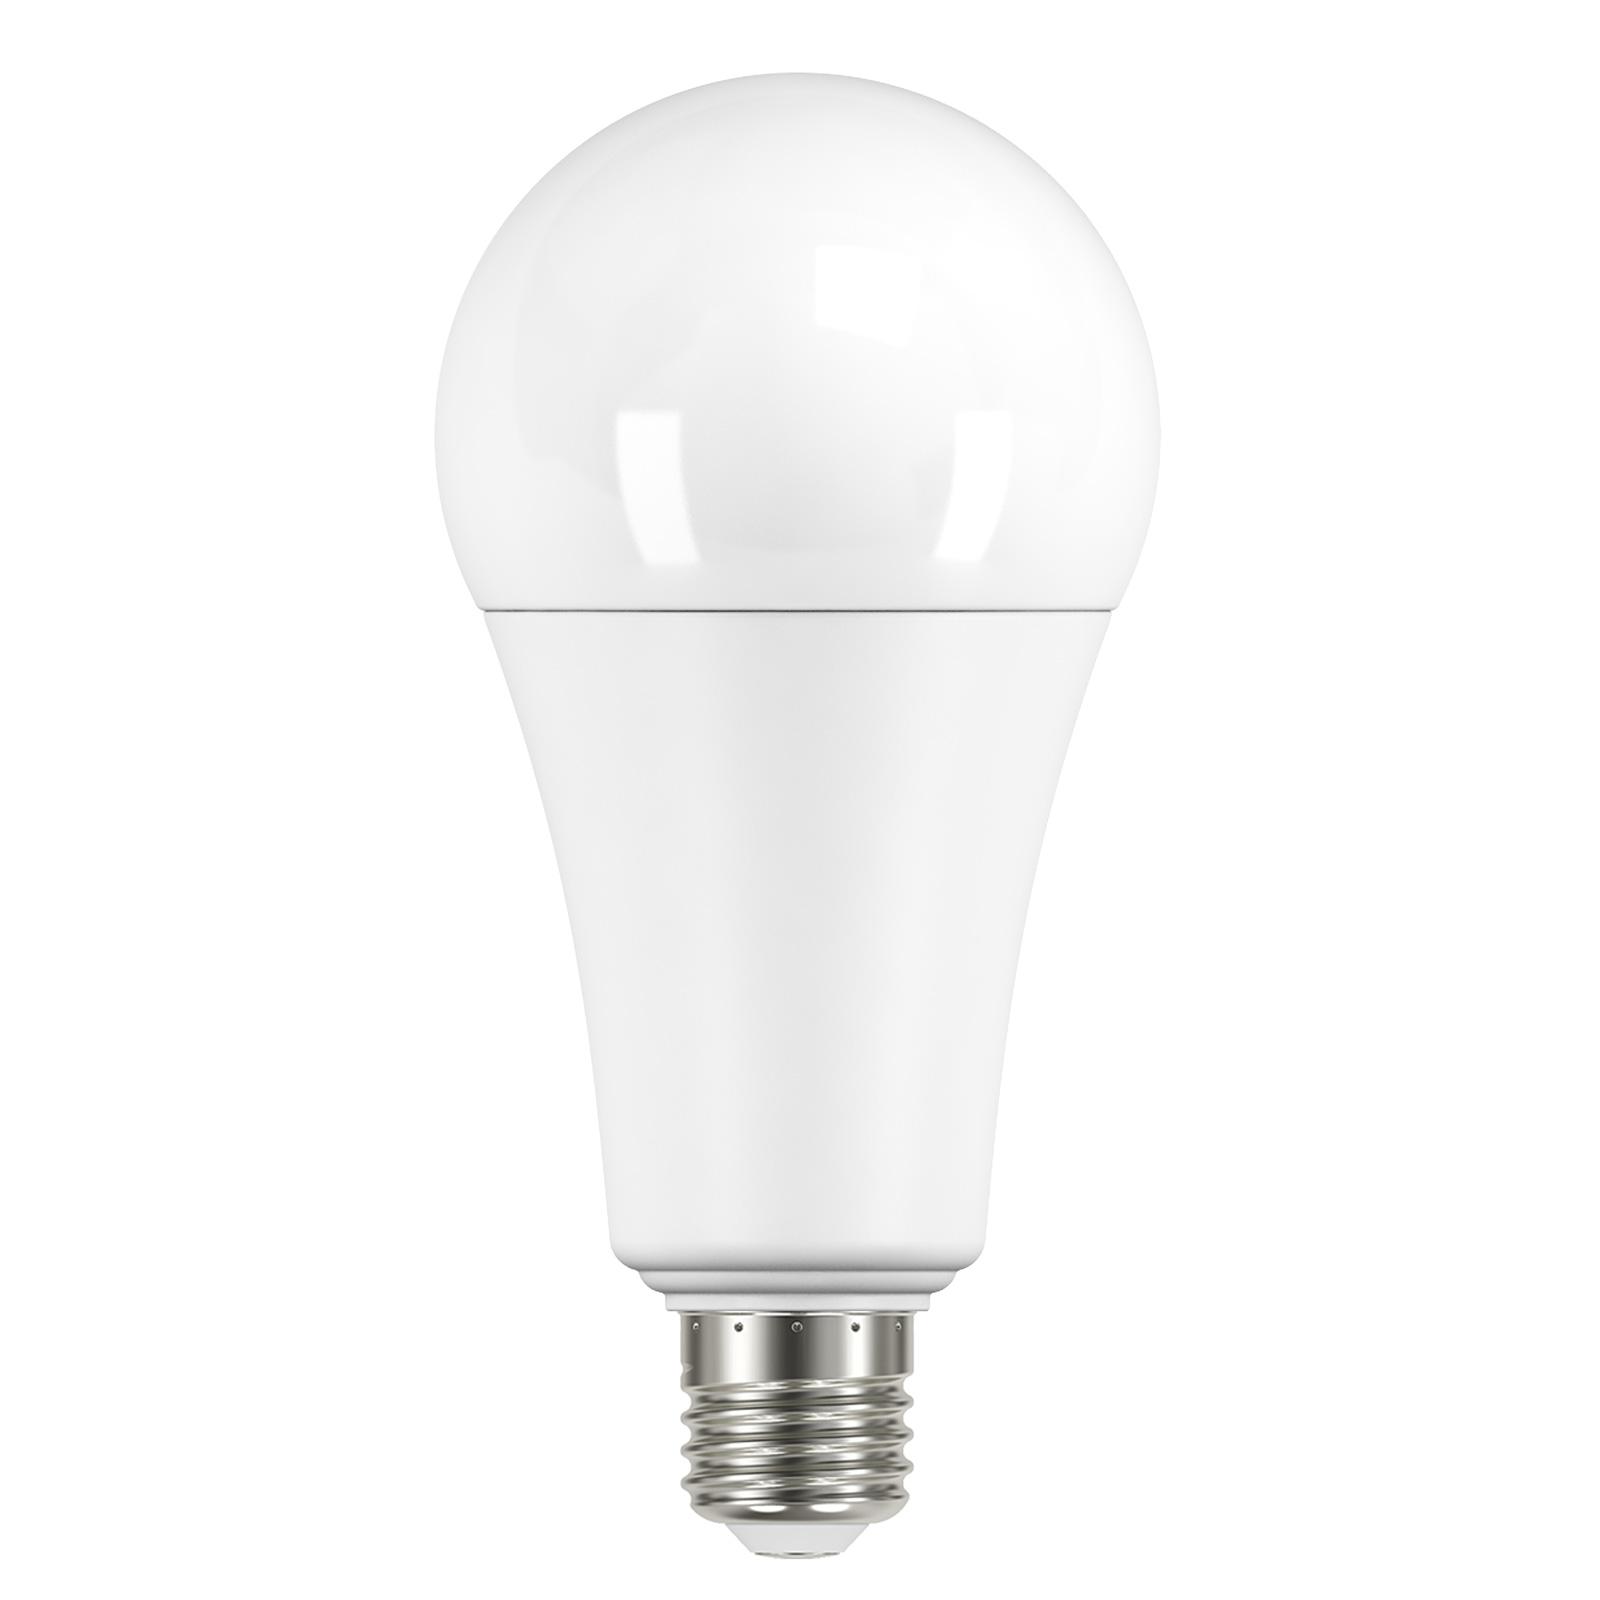 LED-Lampe E27 ToLEDo A60 19W opal, warmweiß